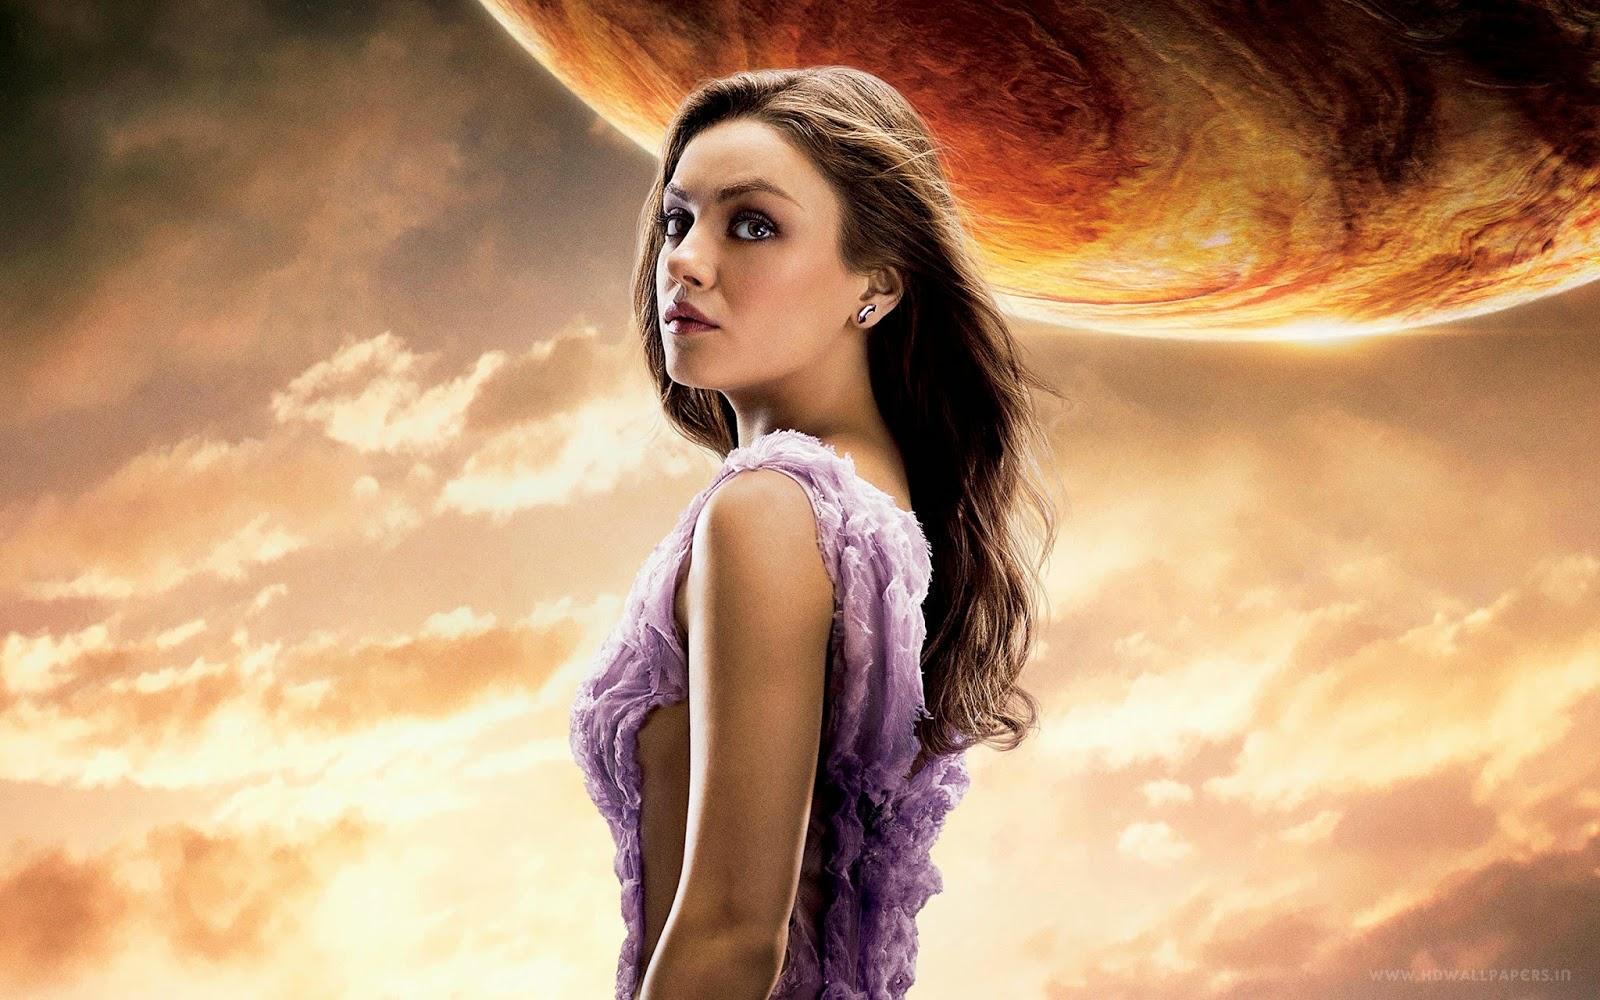 mila kunis jupiter ascending wallpapers - Mila Kunis debuts  Jupiter Ascending,  is coy about her